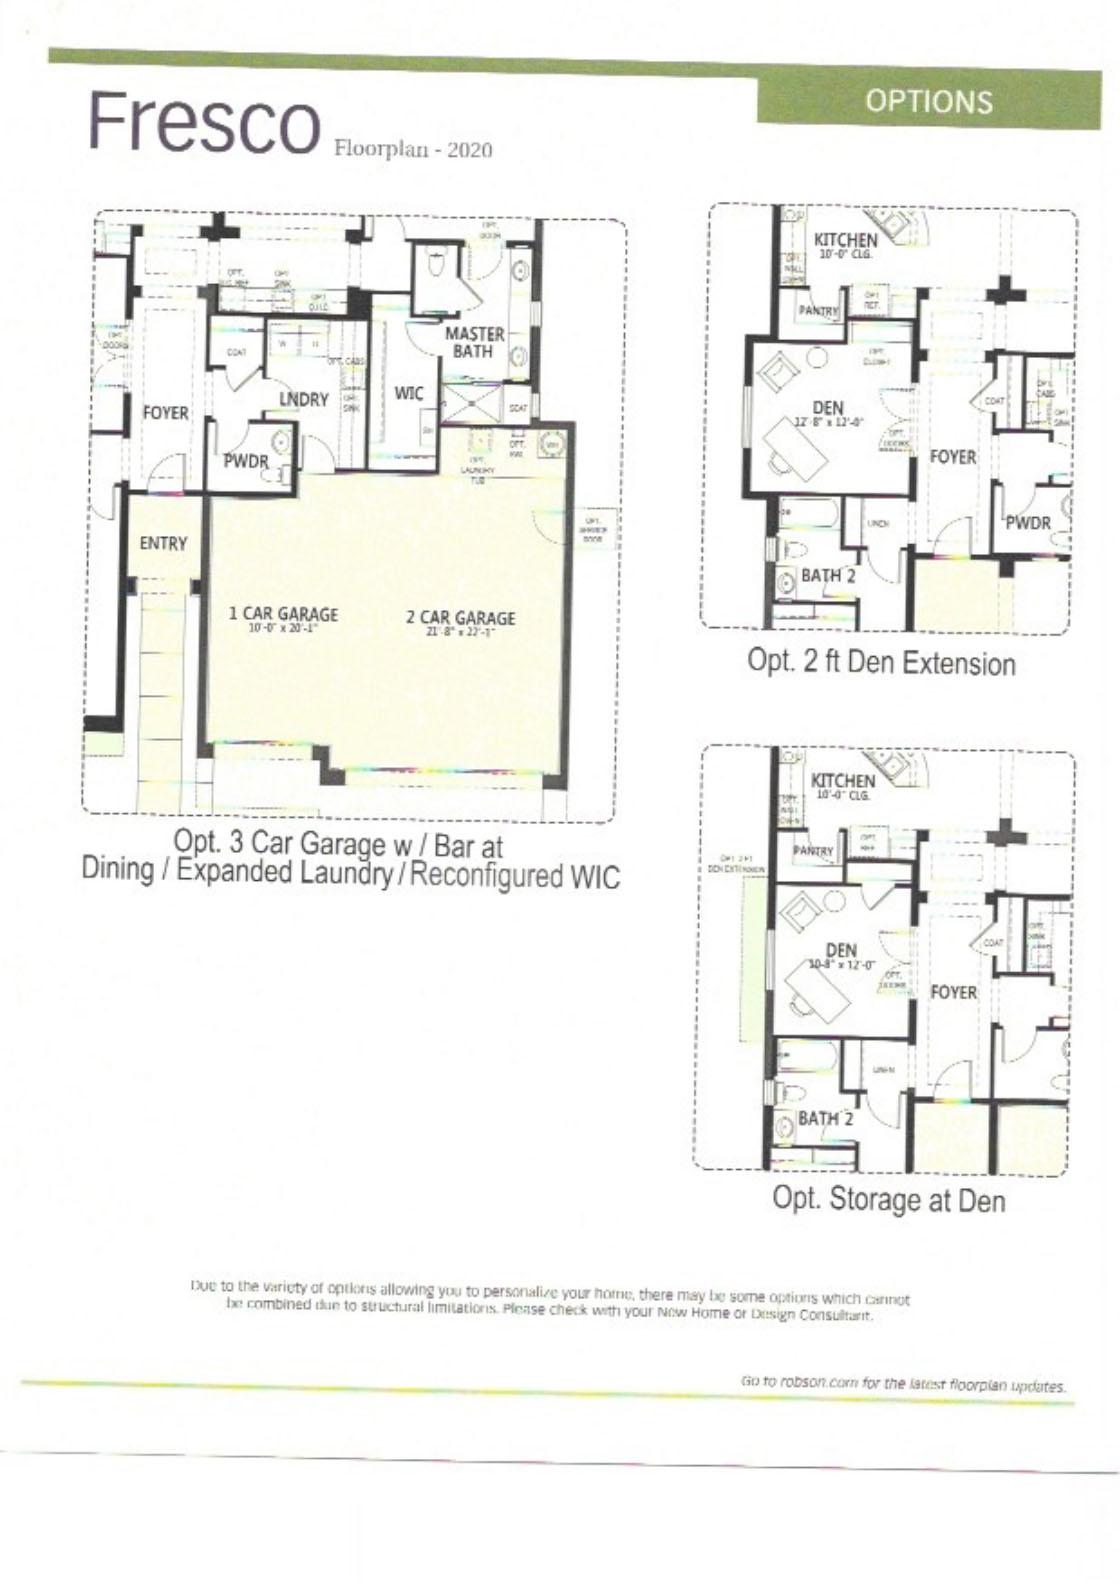 Fresco (with options).pdf